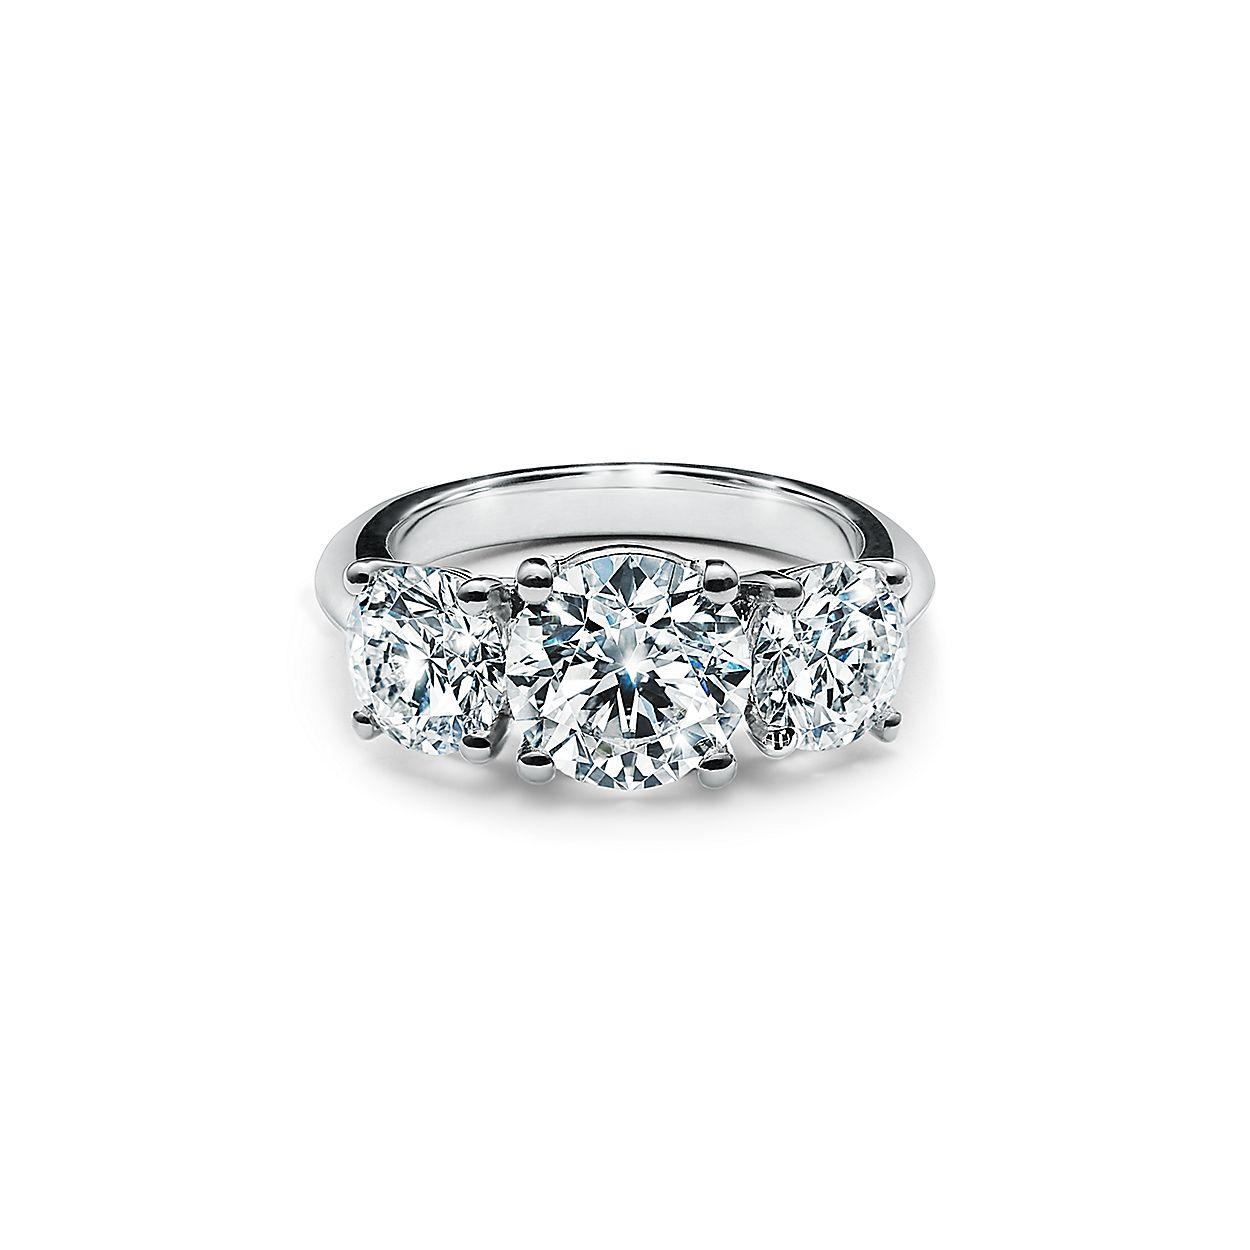 7f4210323b8e5 Tiffany Three Stone Engagement Ring in Platinum